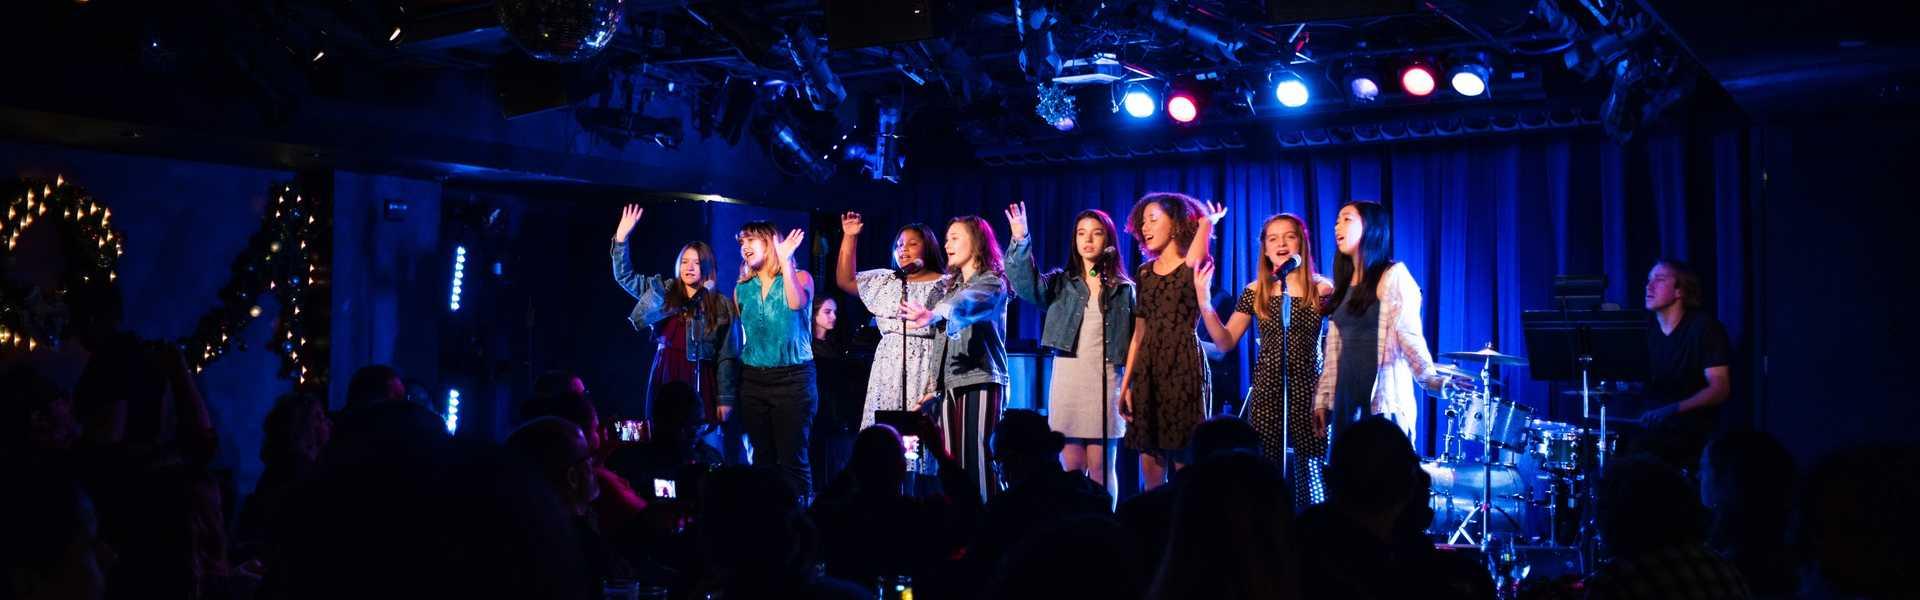 Kids performing in New York image